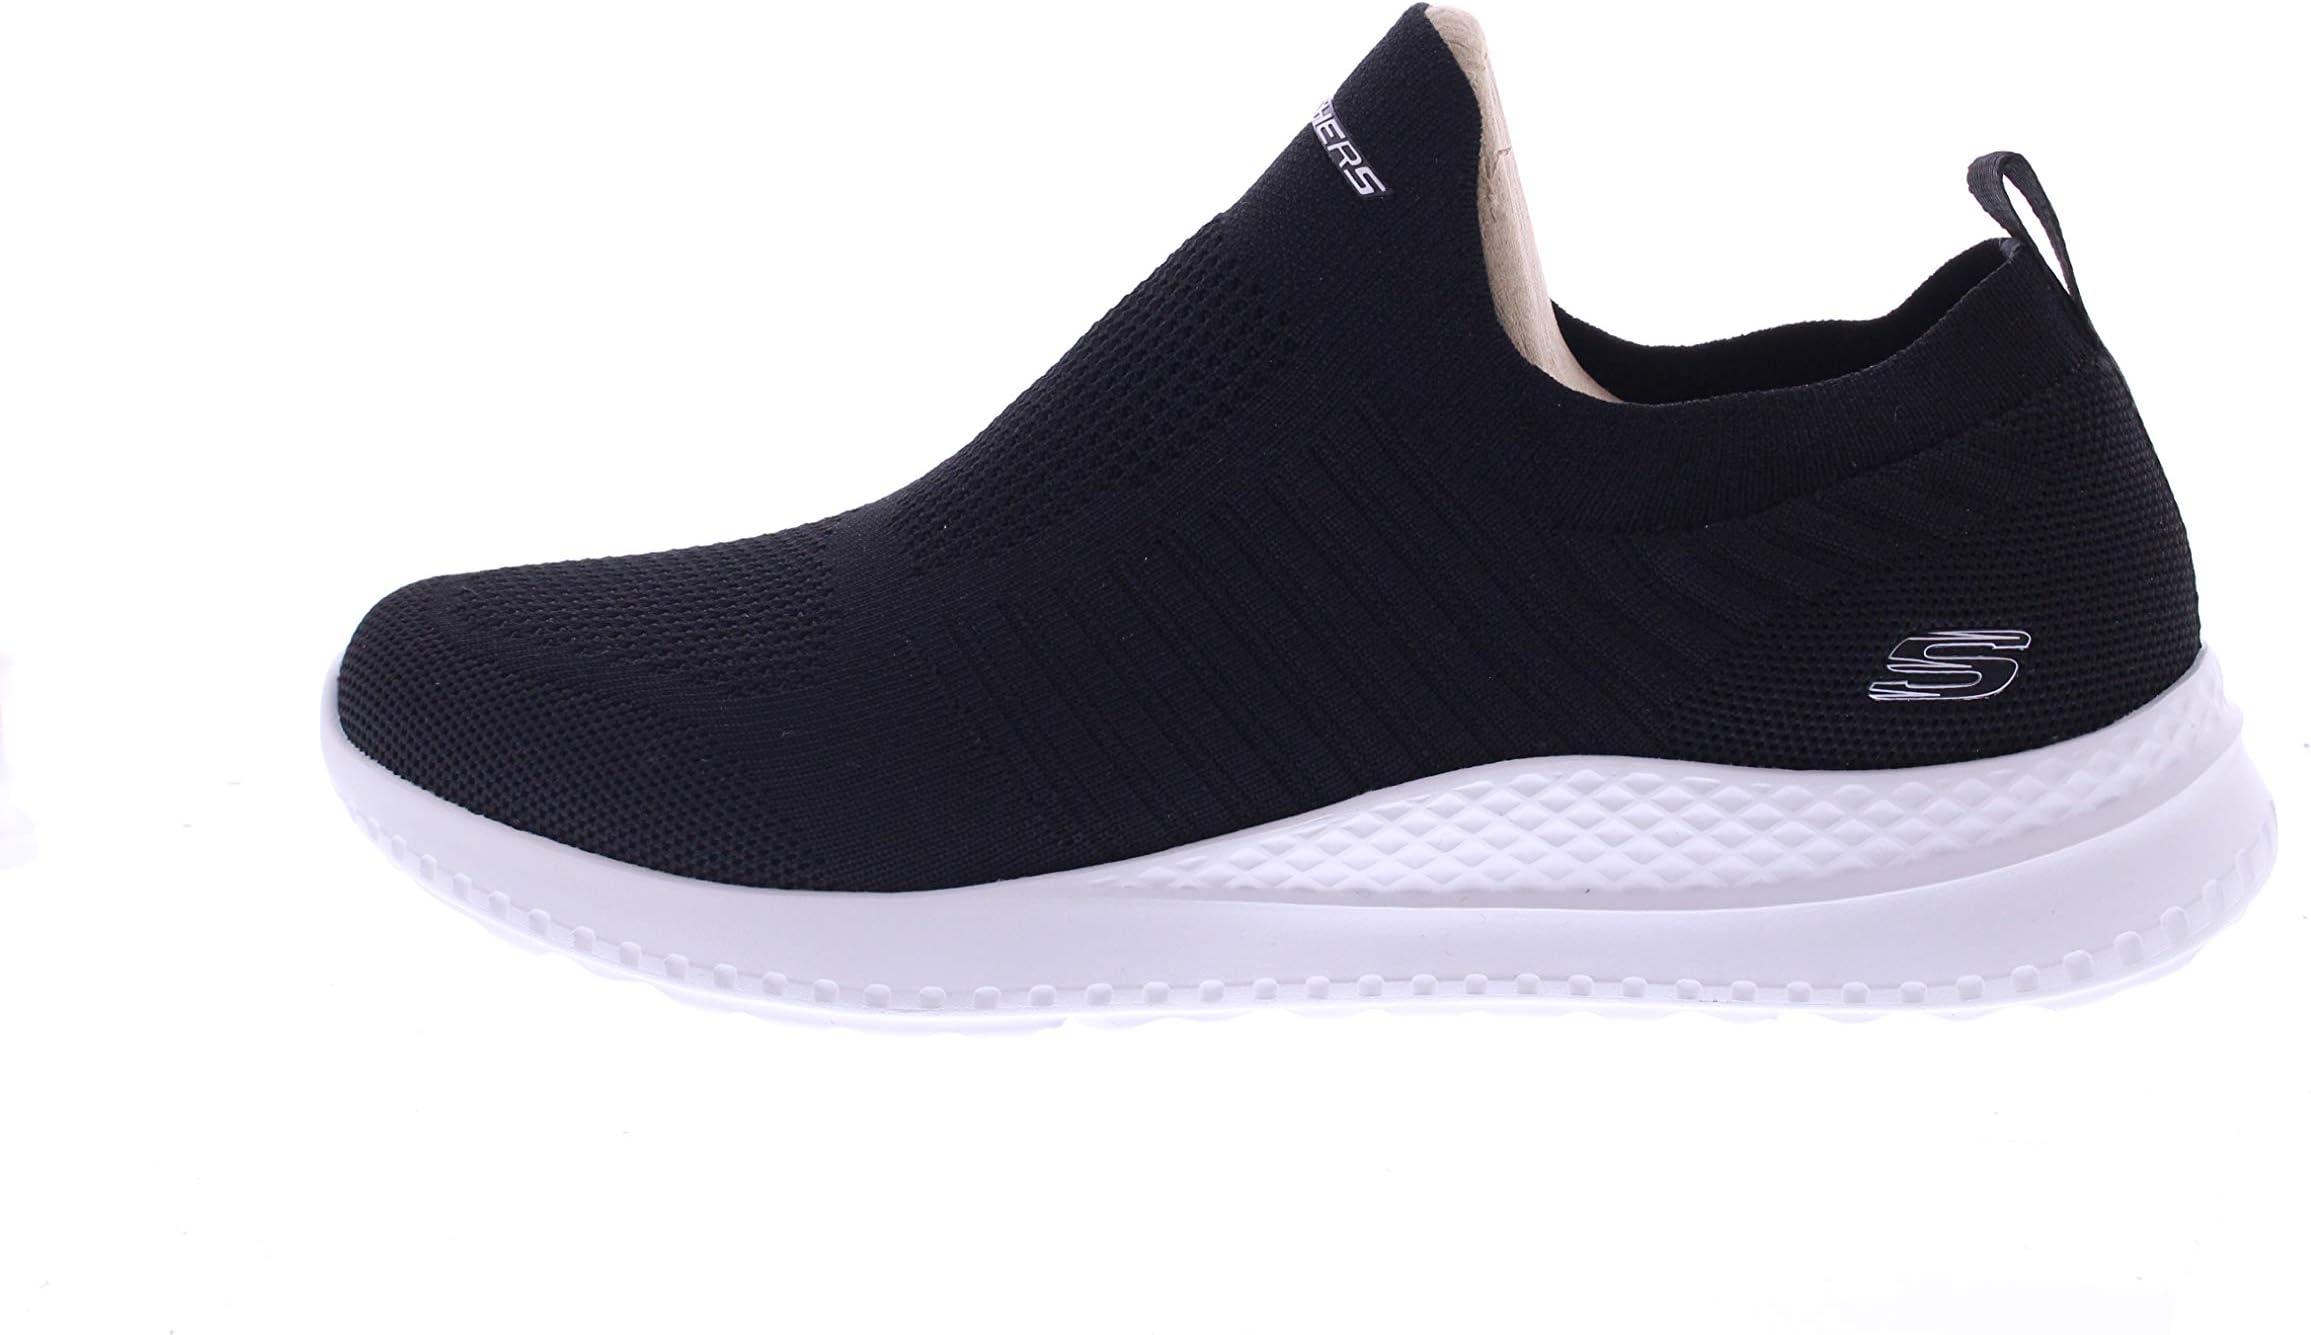 Skechers Matera, Men's Shoes price in